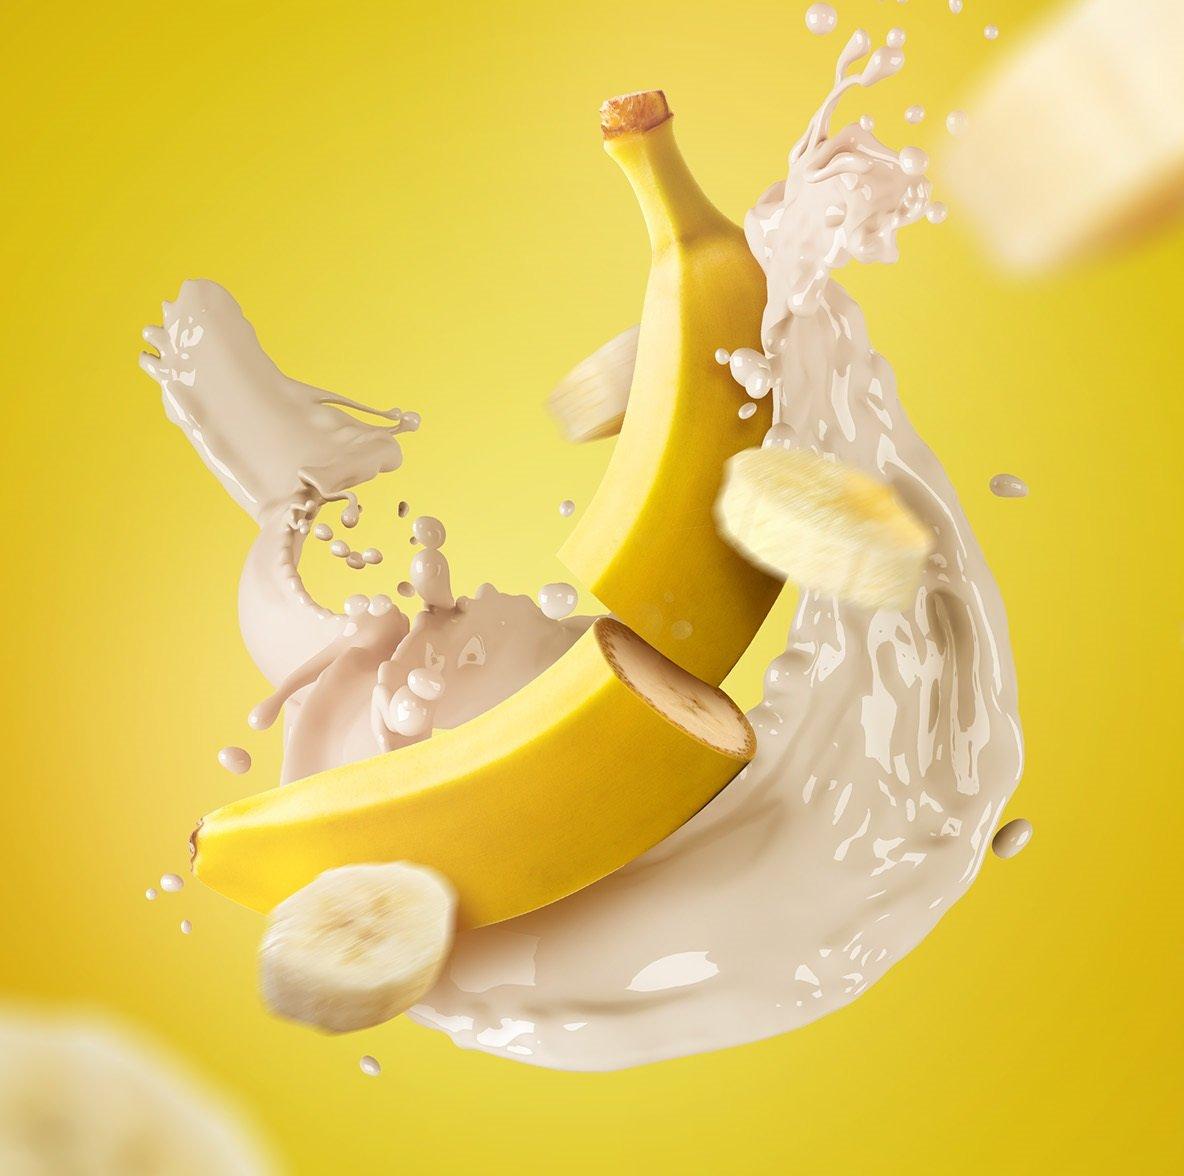 Енергизиращ Масаж с банан